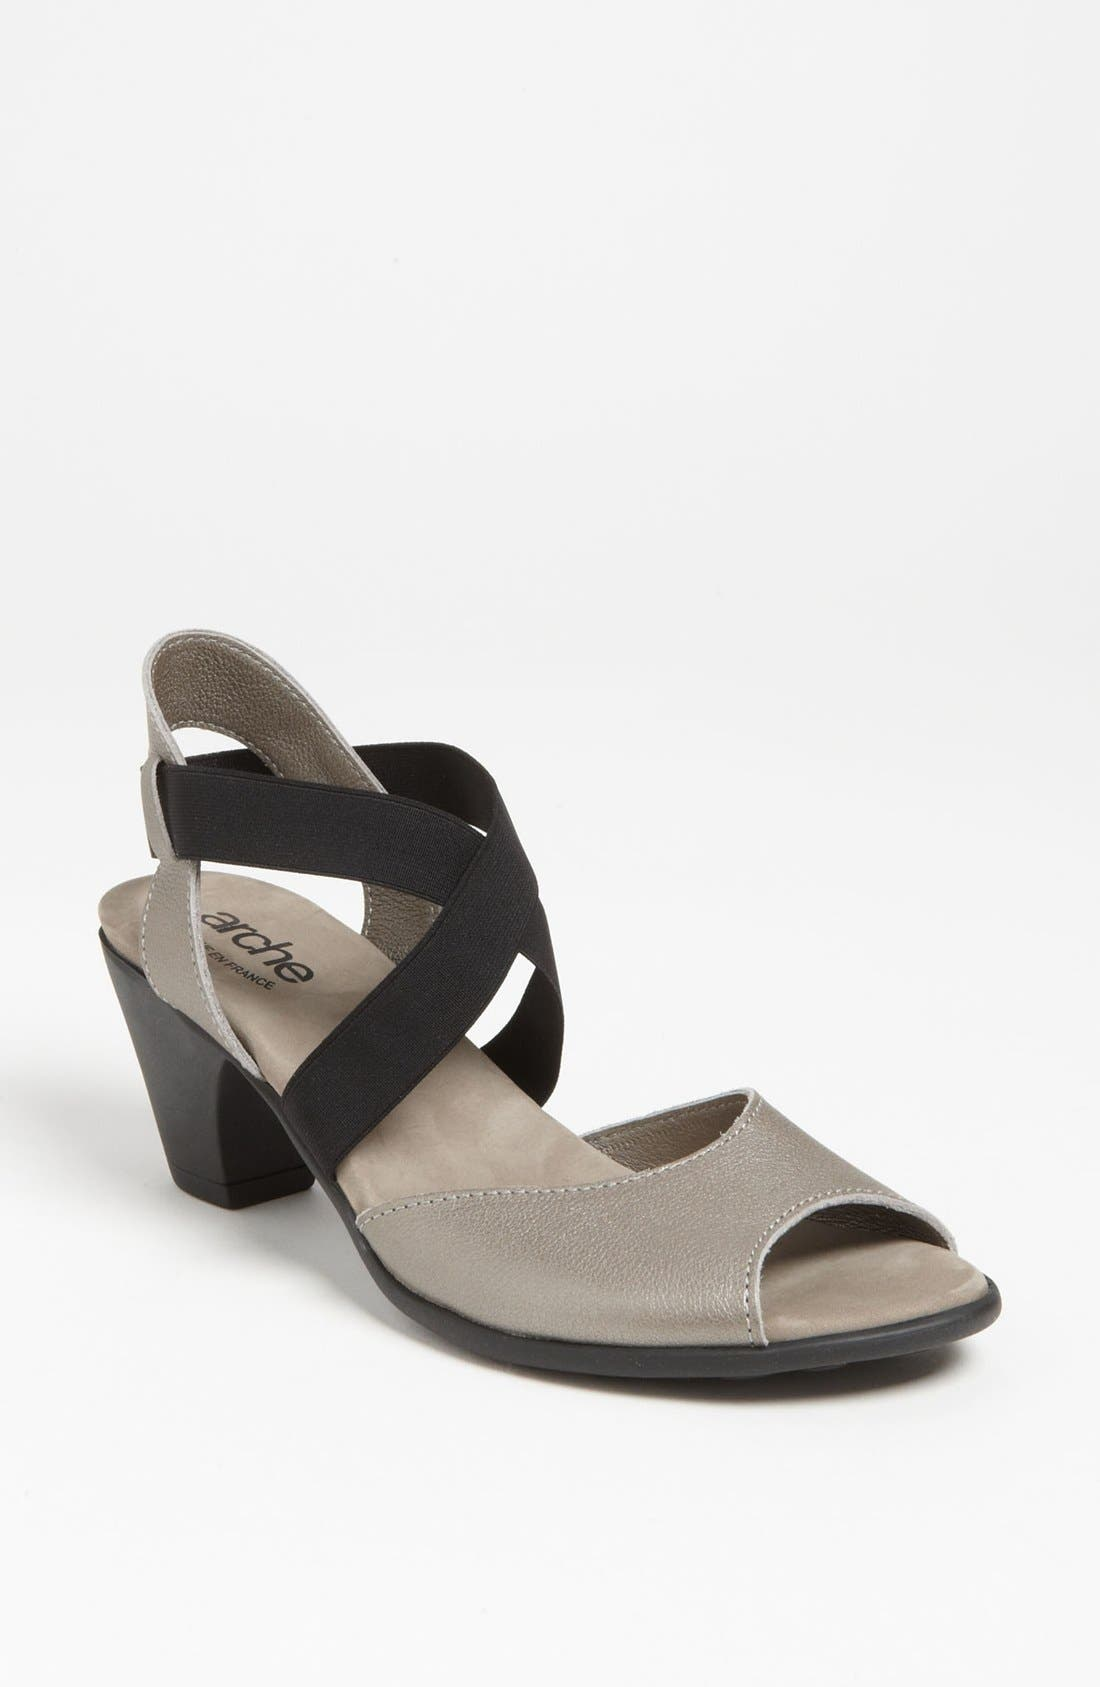 Alternate Image 1 Selected - Arche 'Mityam' Sandal